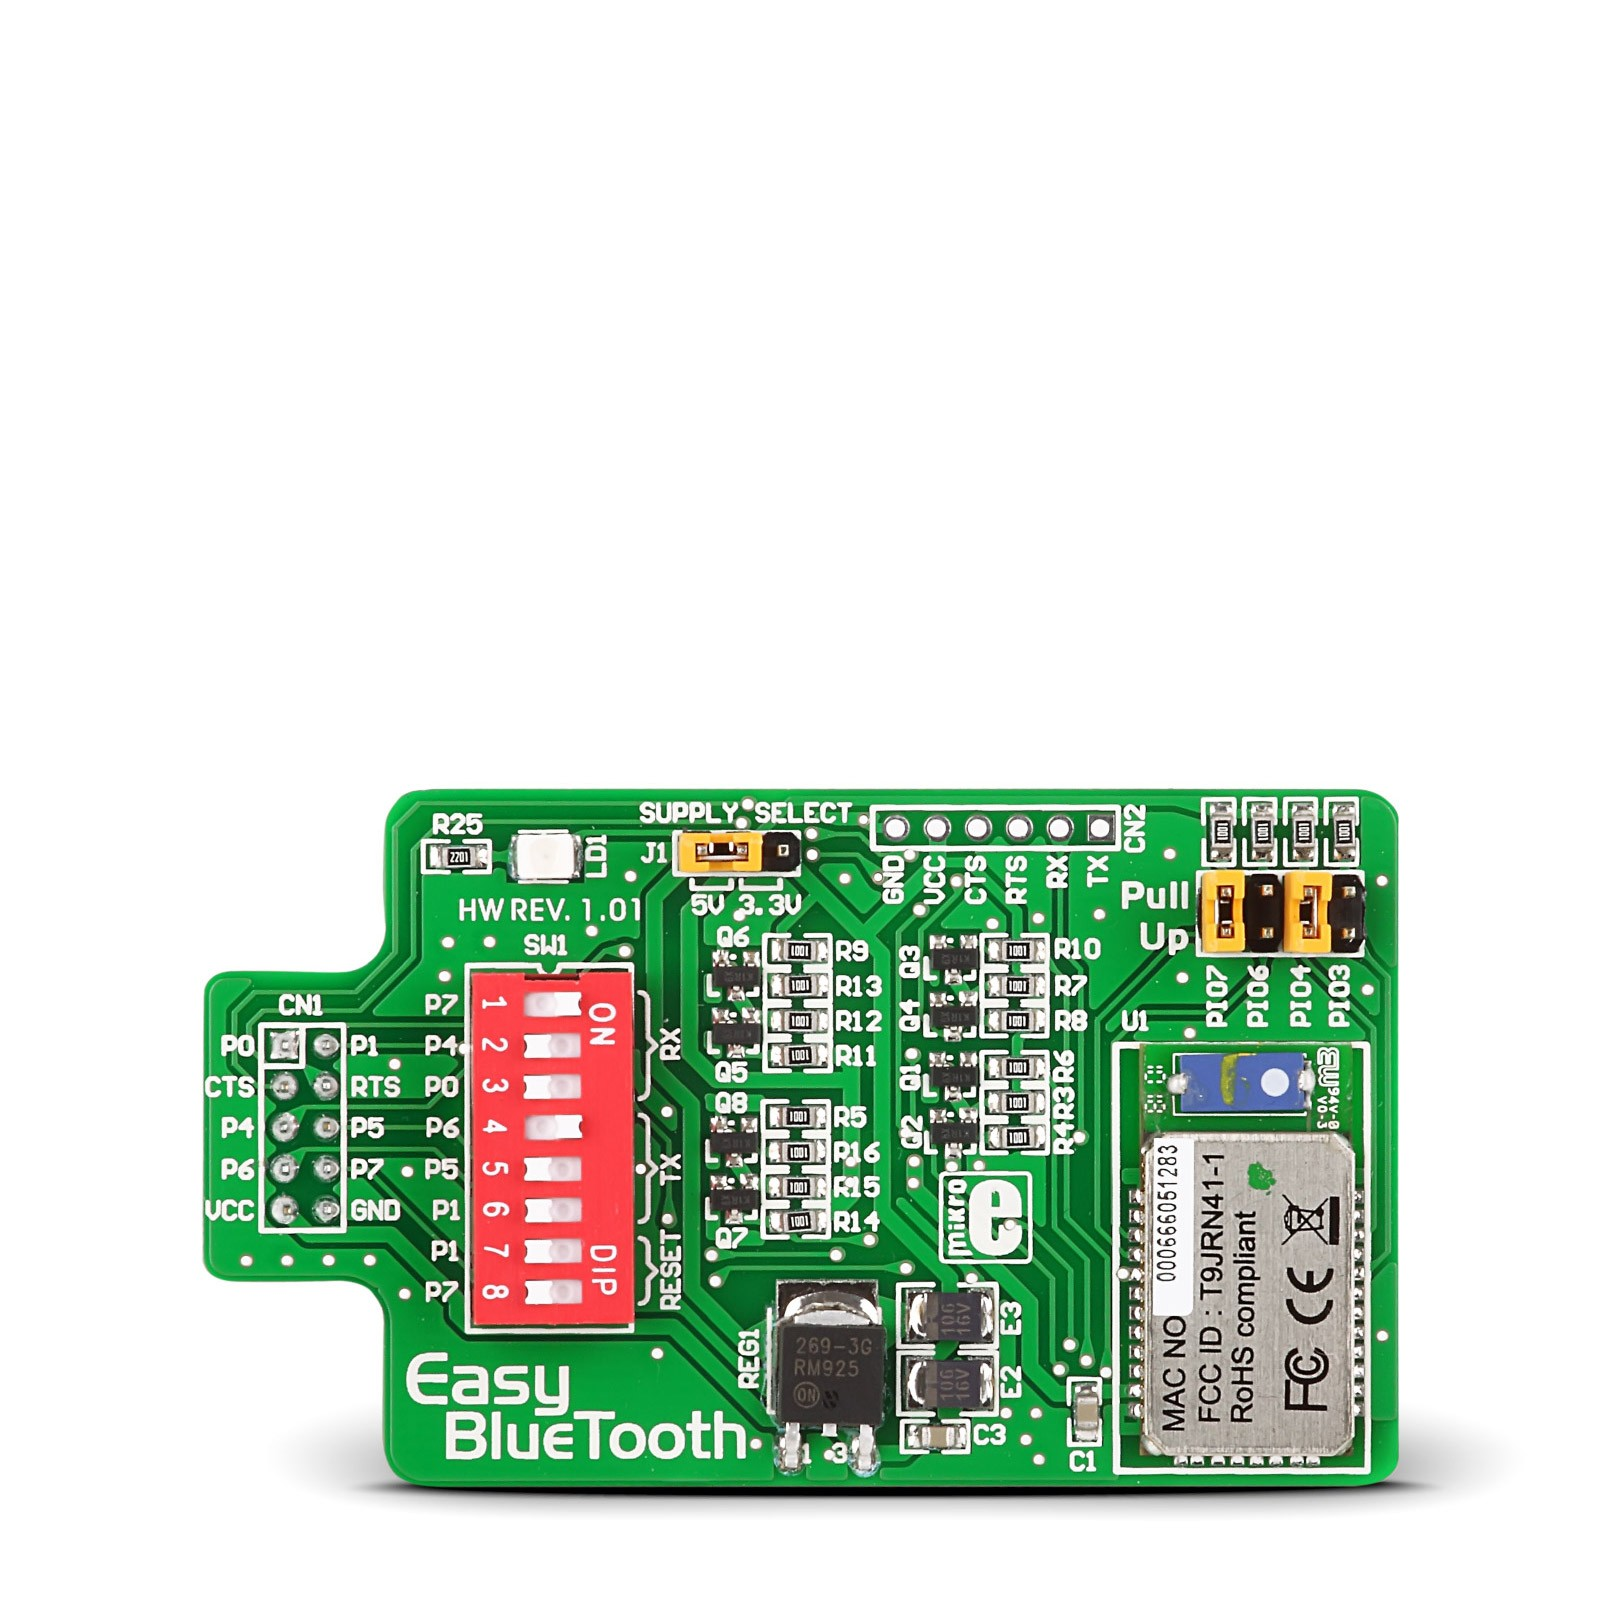 Easy BlueTooth - RN-41 Module Development Board